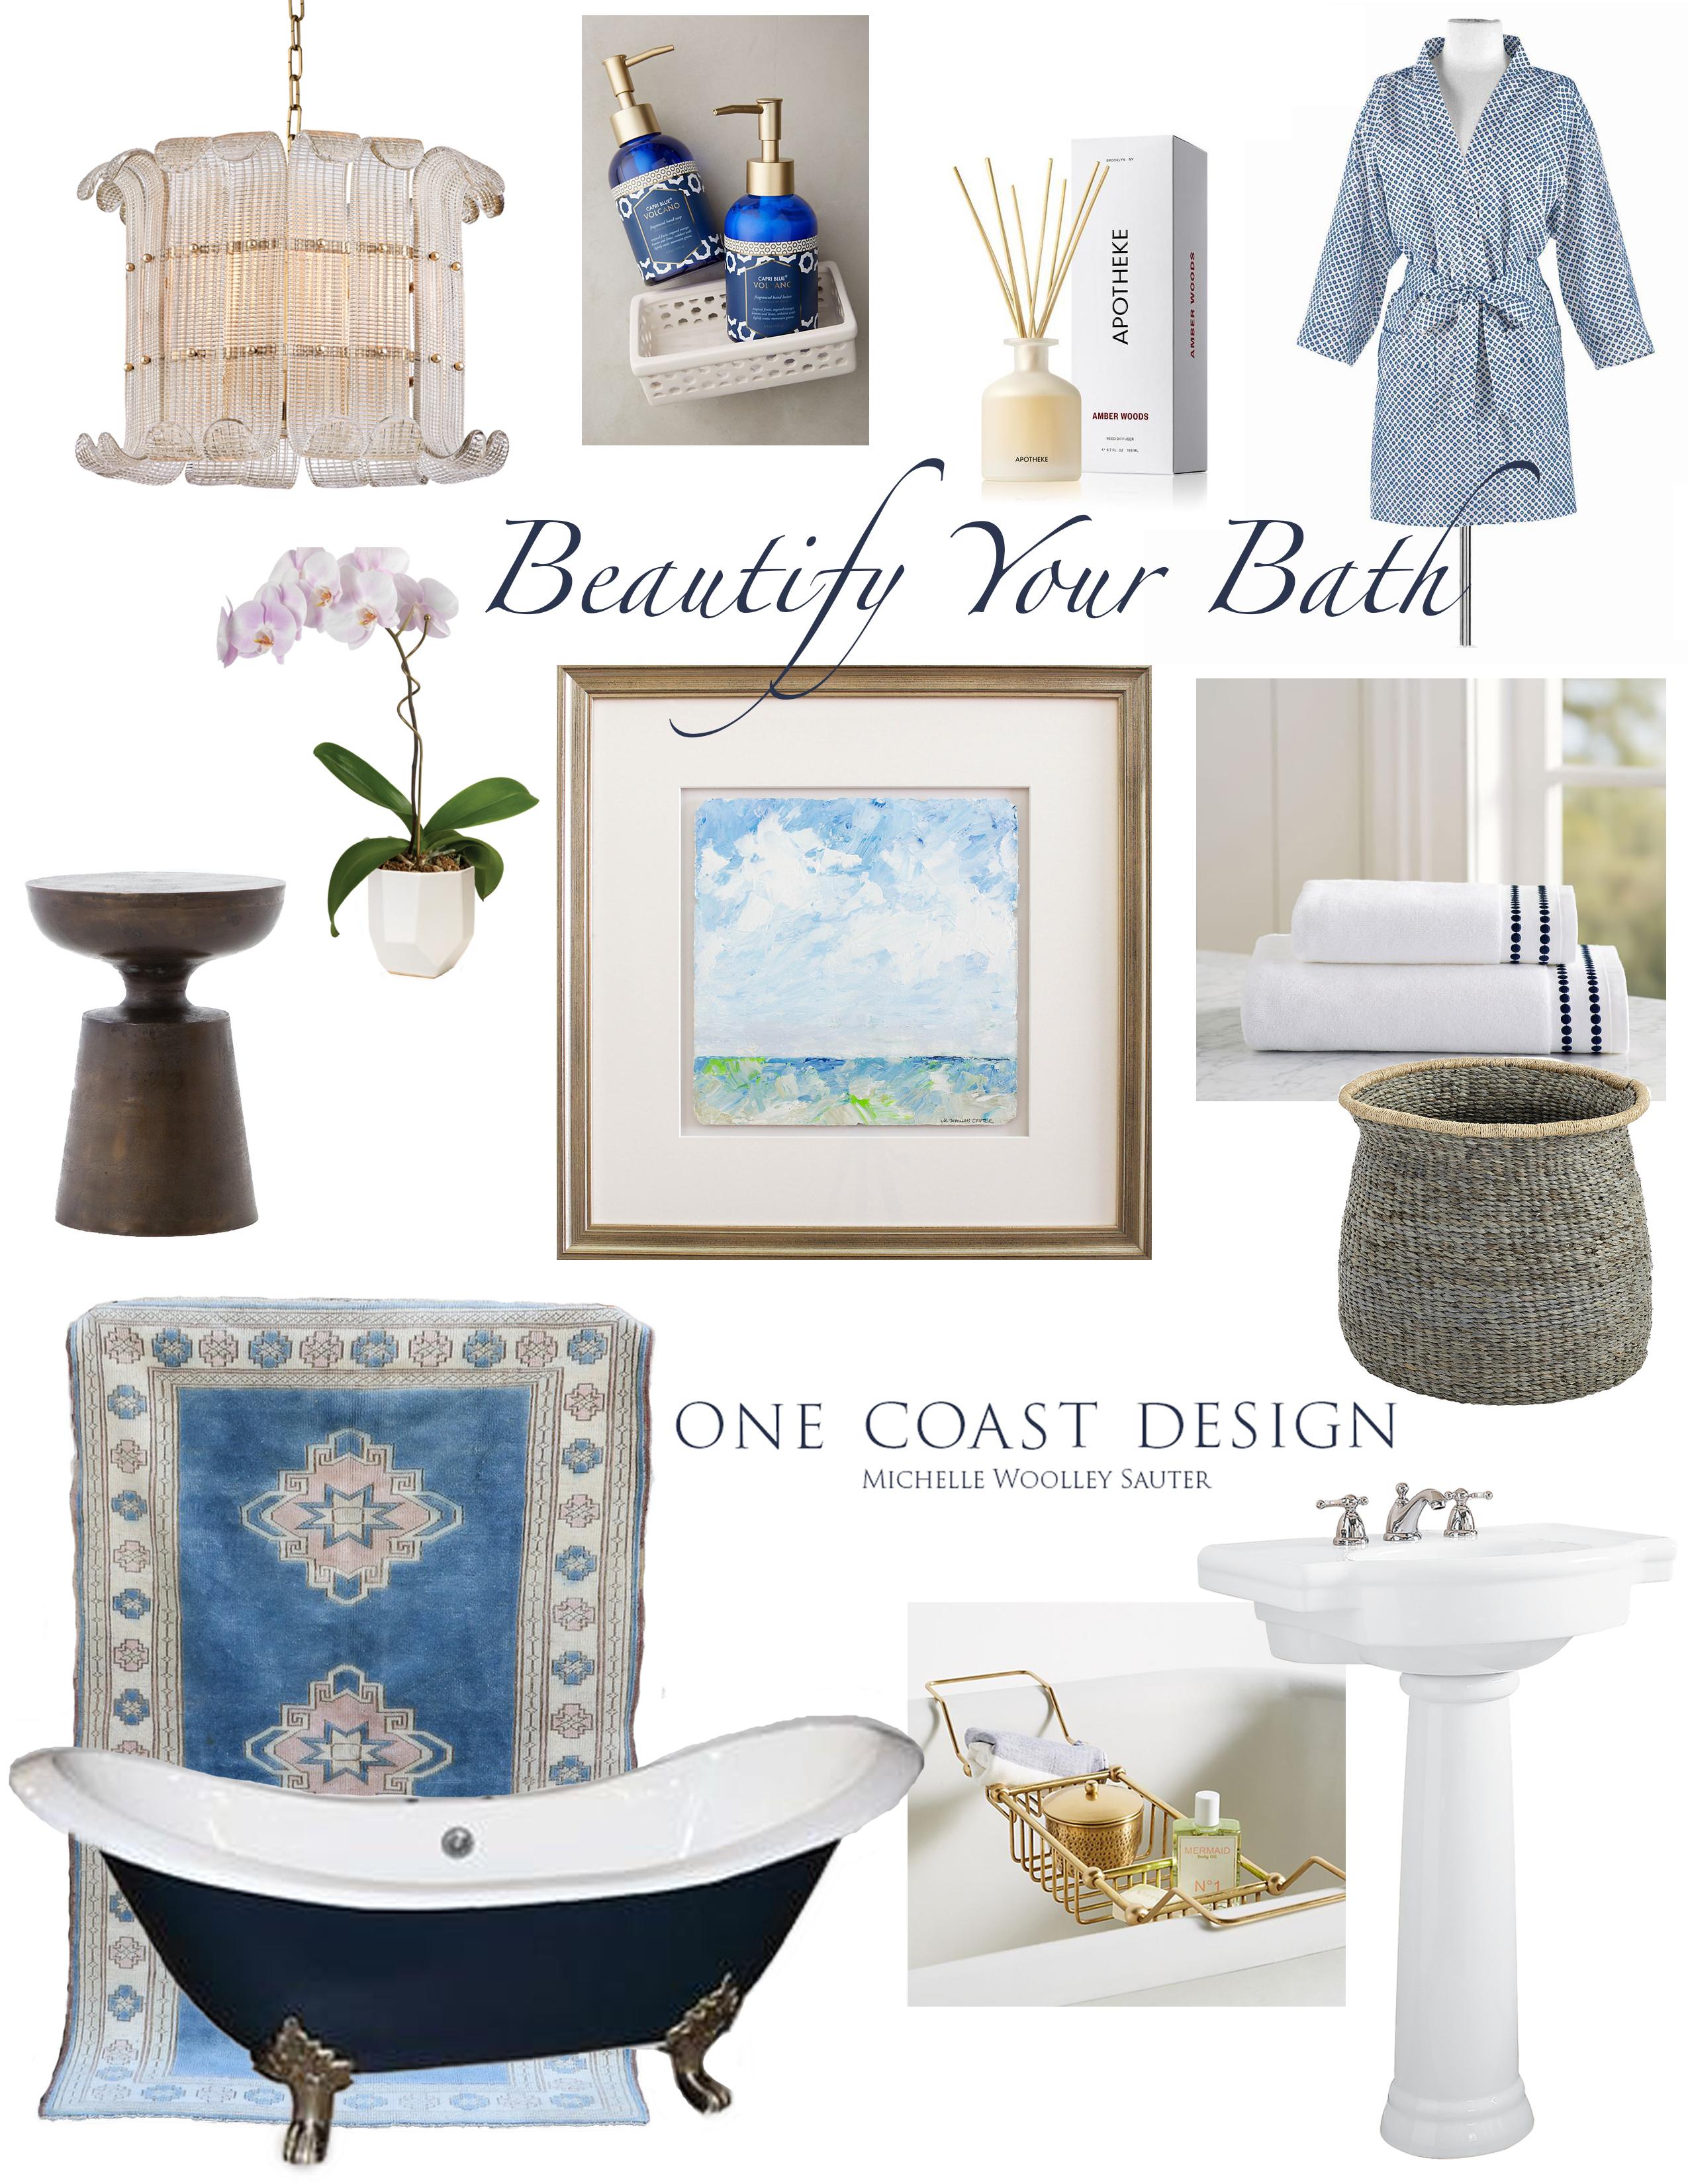 Beautify Your Bath, Bathroom Ideas, Summersville SC Interior Design, One Coast Design